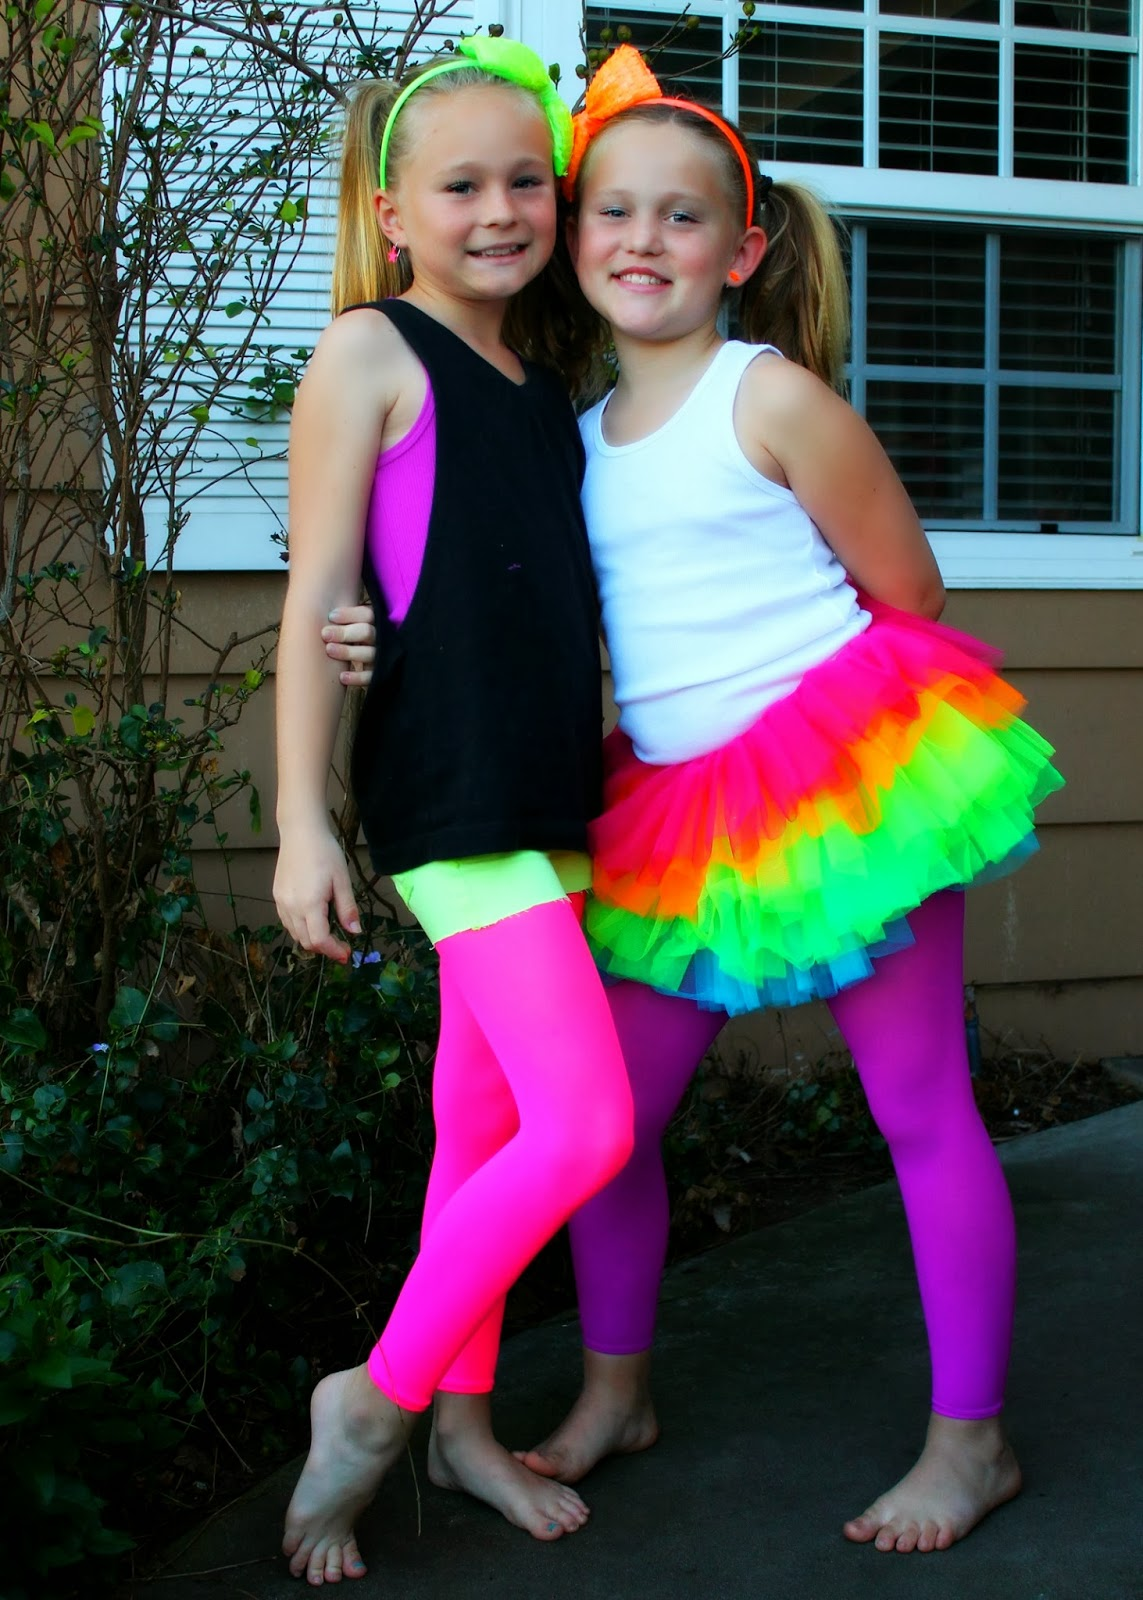 Bringing Up Burns Mollyu0026#39;s NINTH Neon/Glow in the Dark Dance Birthday Party